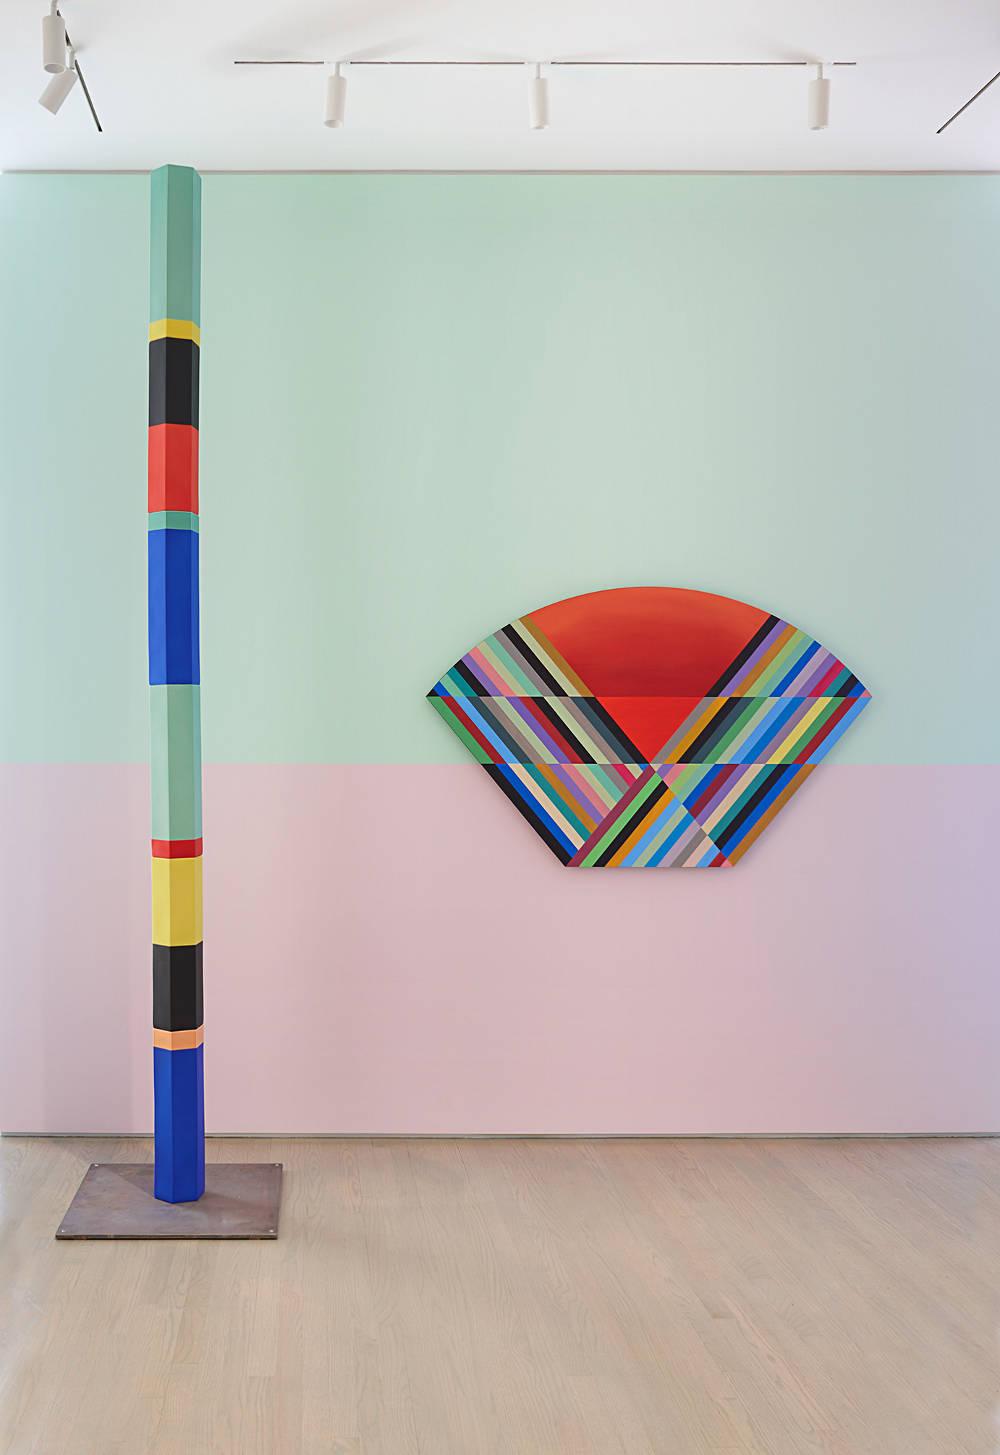 Helwaser Gallery